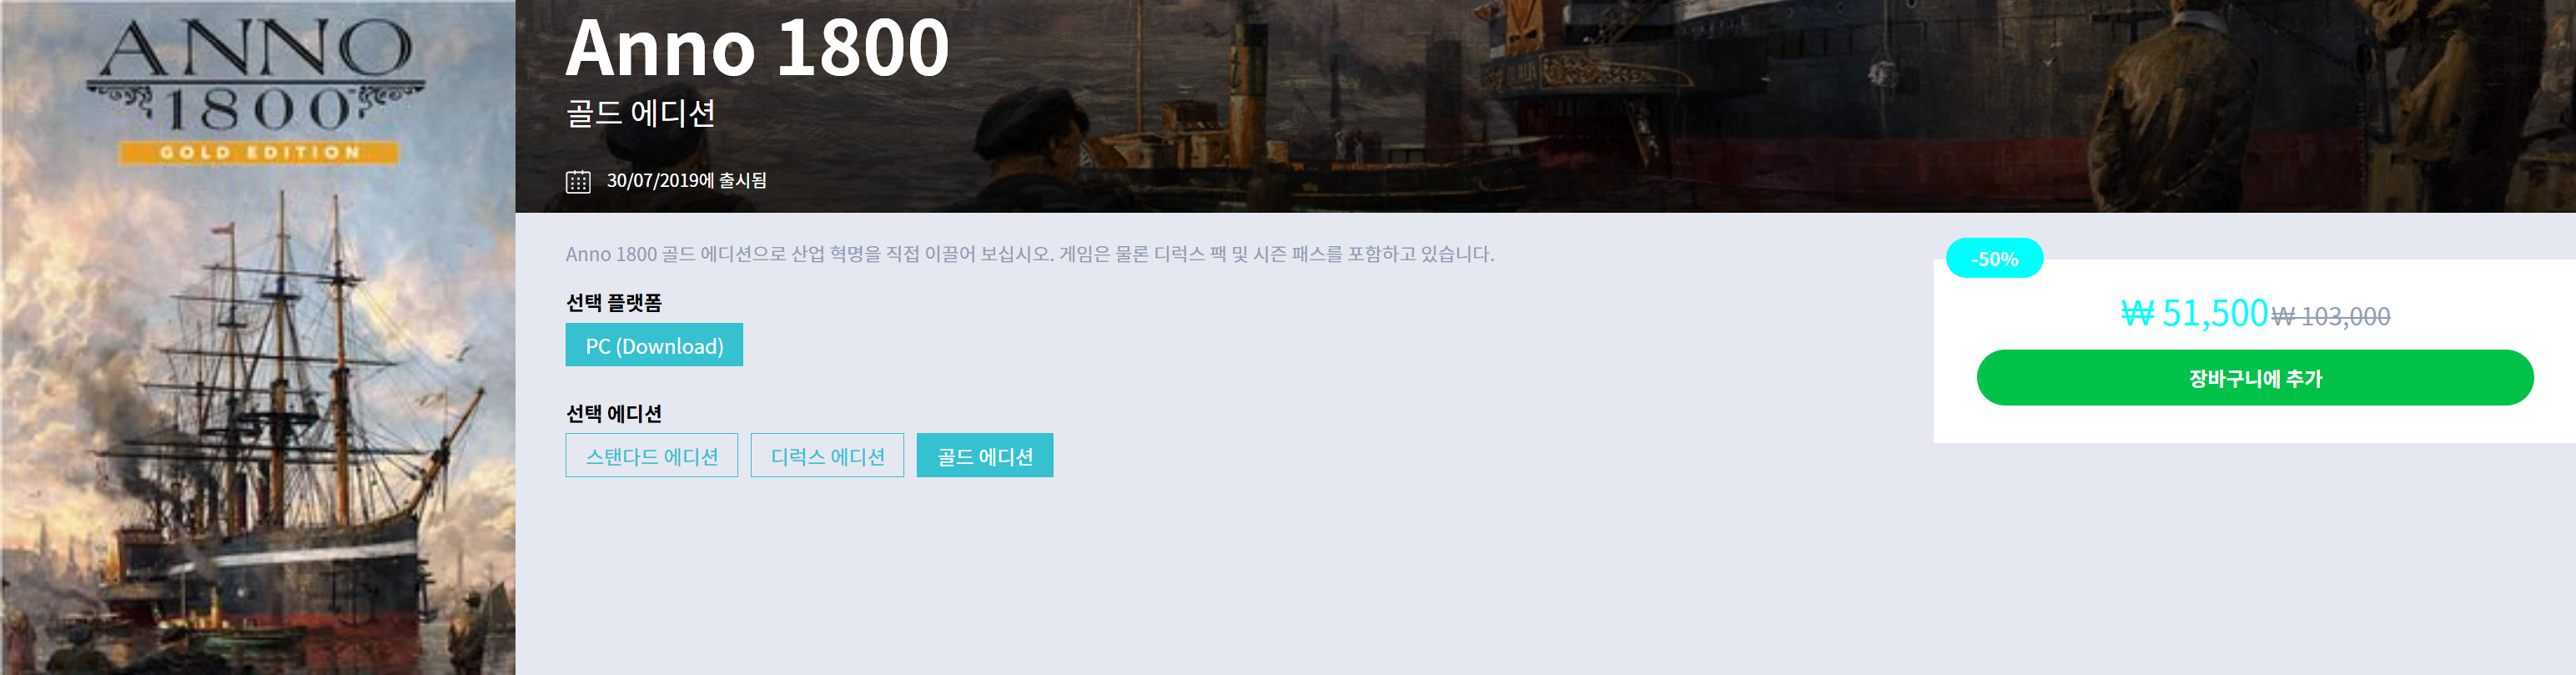 Screenshot_2019-12-01 Anno 1800 gold.jpg